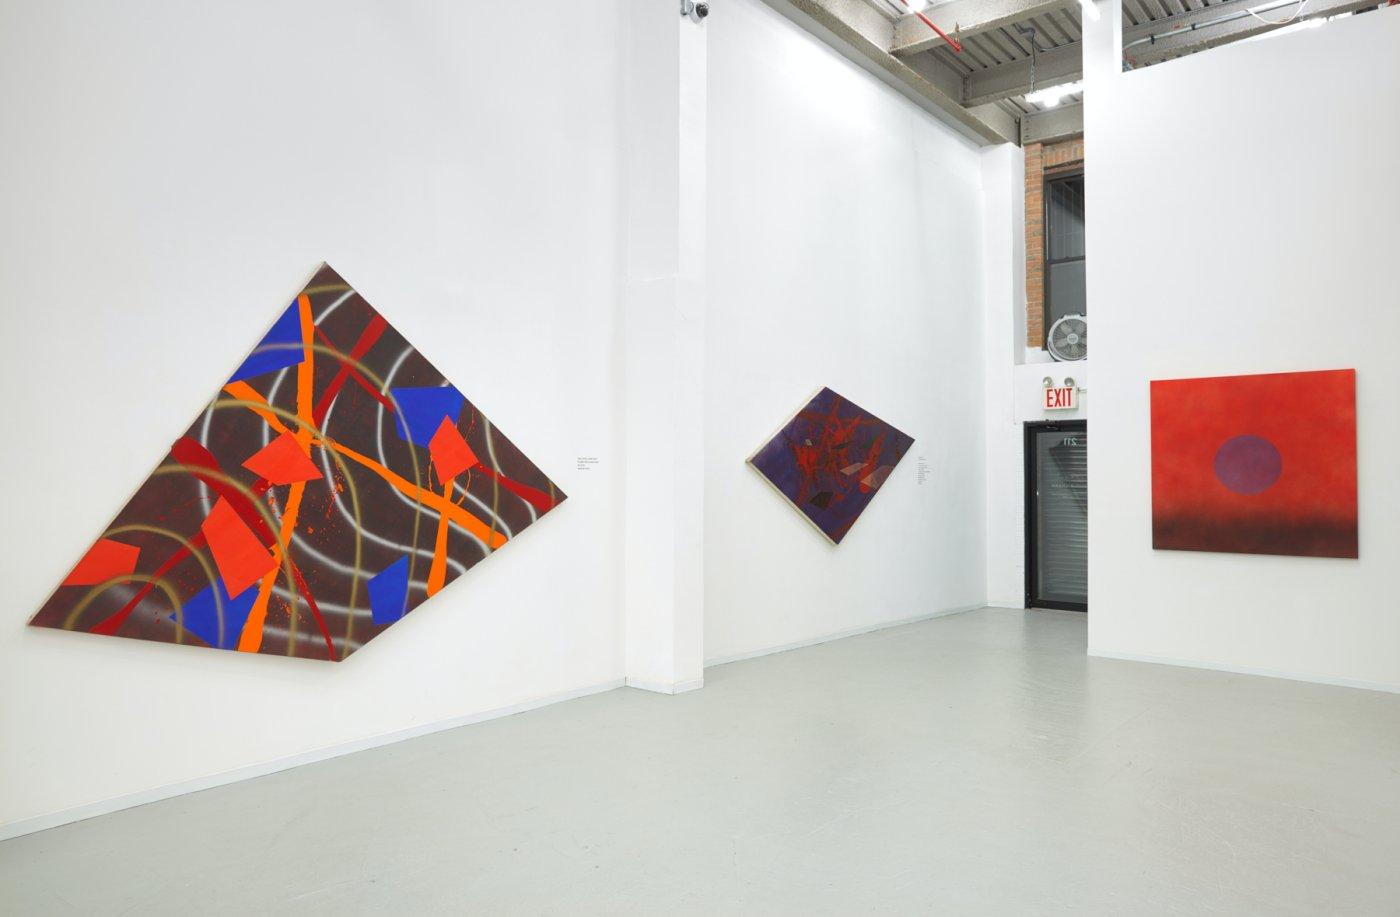 David Richard Gallery Lester Rapaport 2